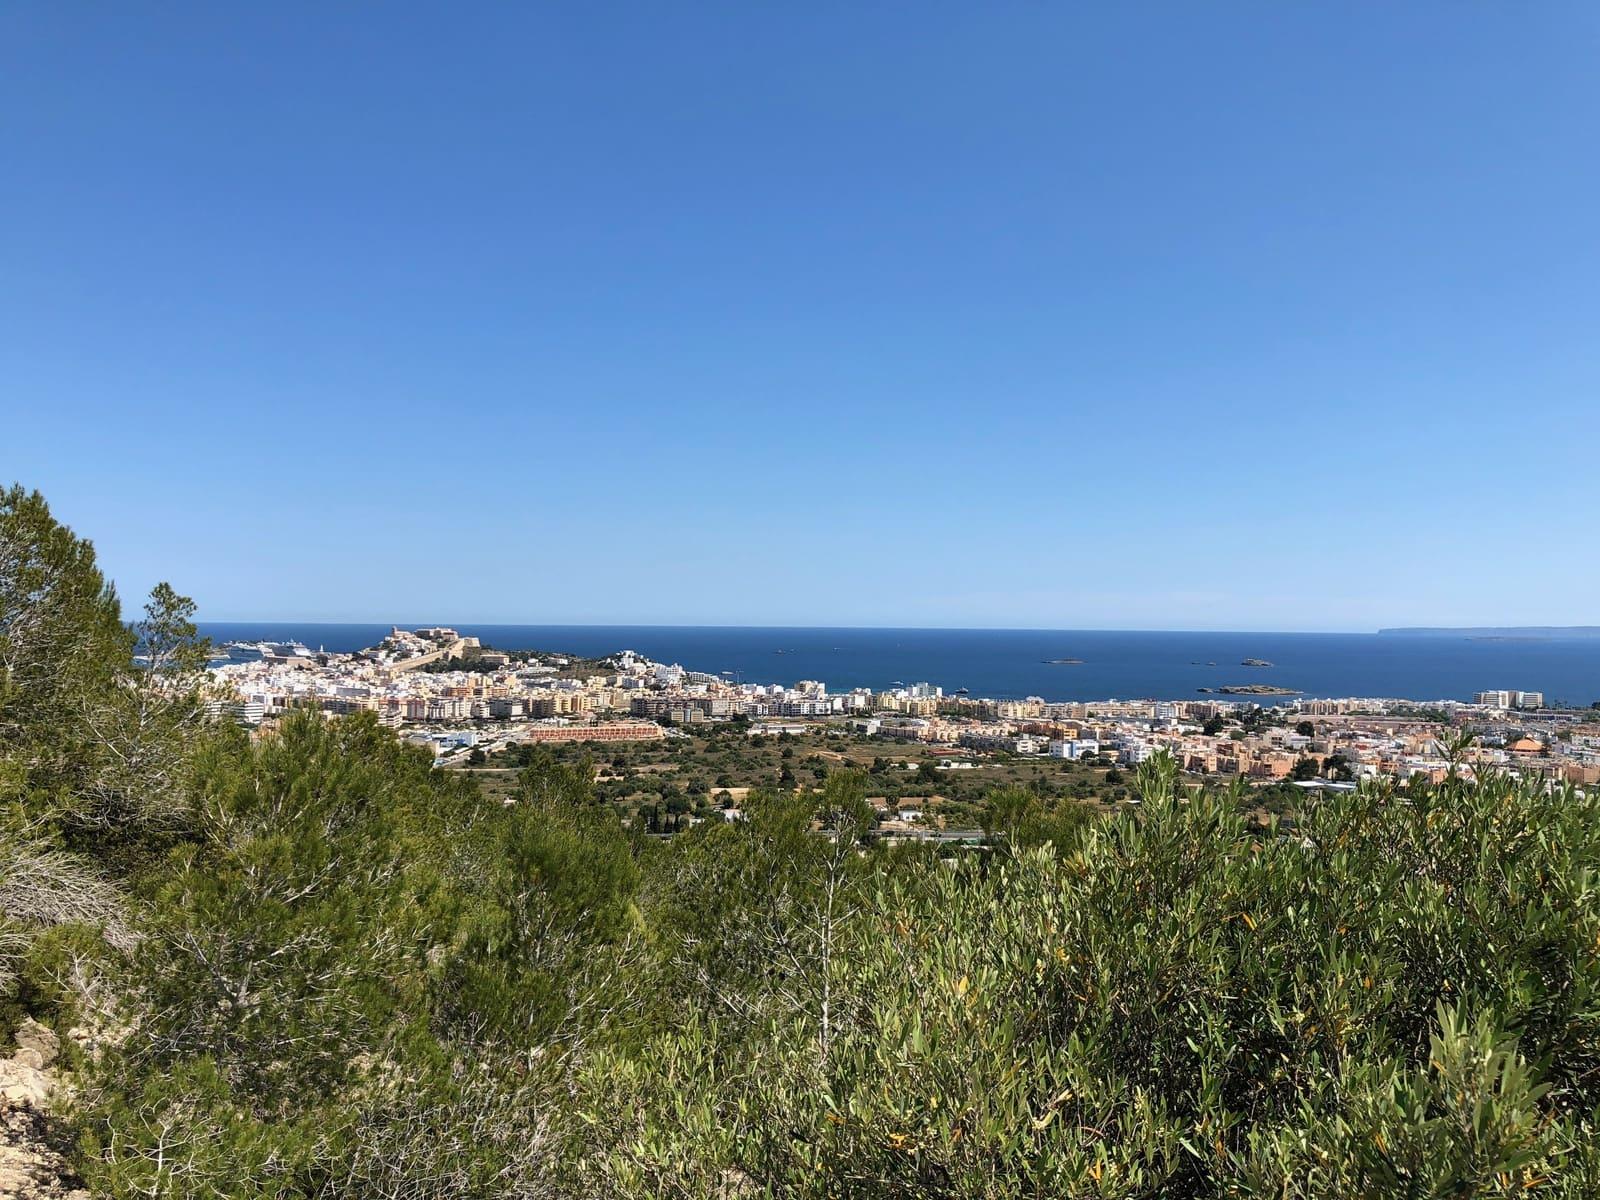 Byggetomt til salgs i Ibiza by - € 1 295 000 (Ref: 4057465)